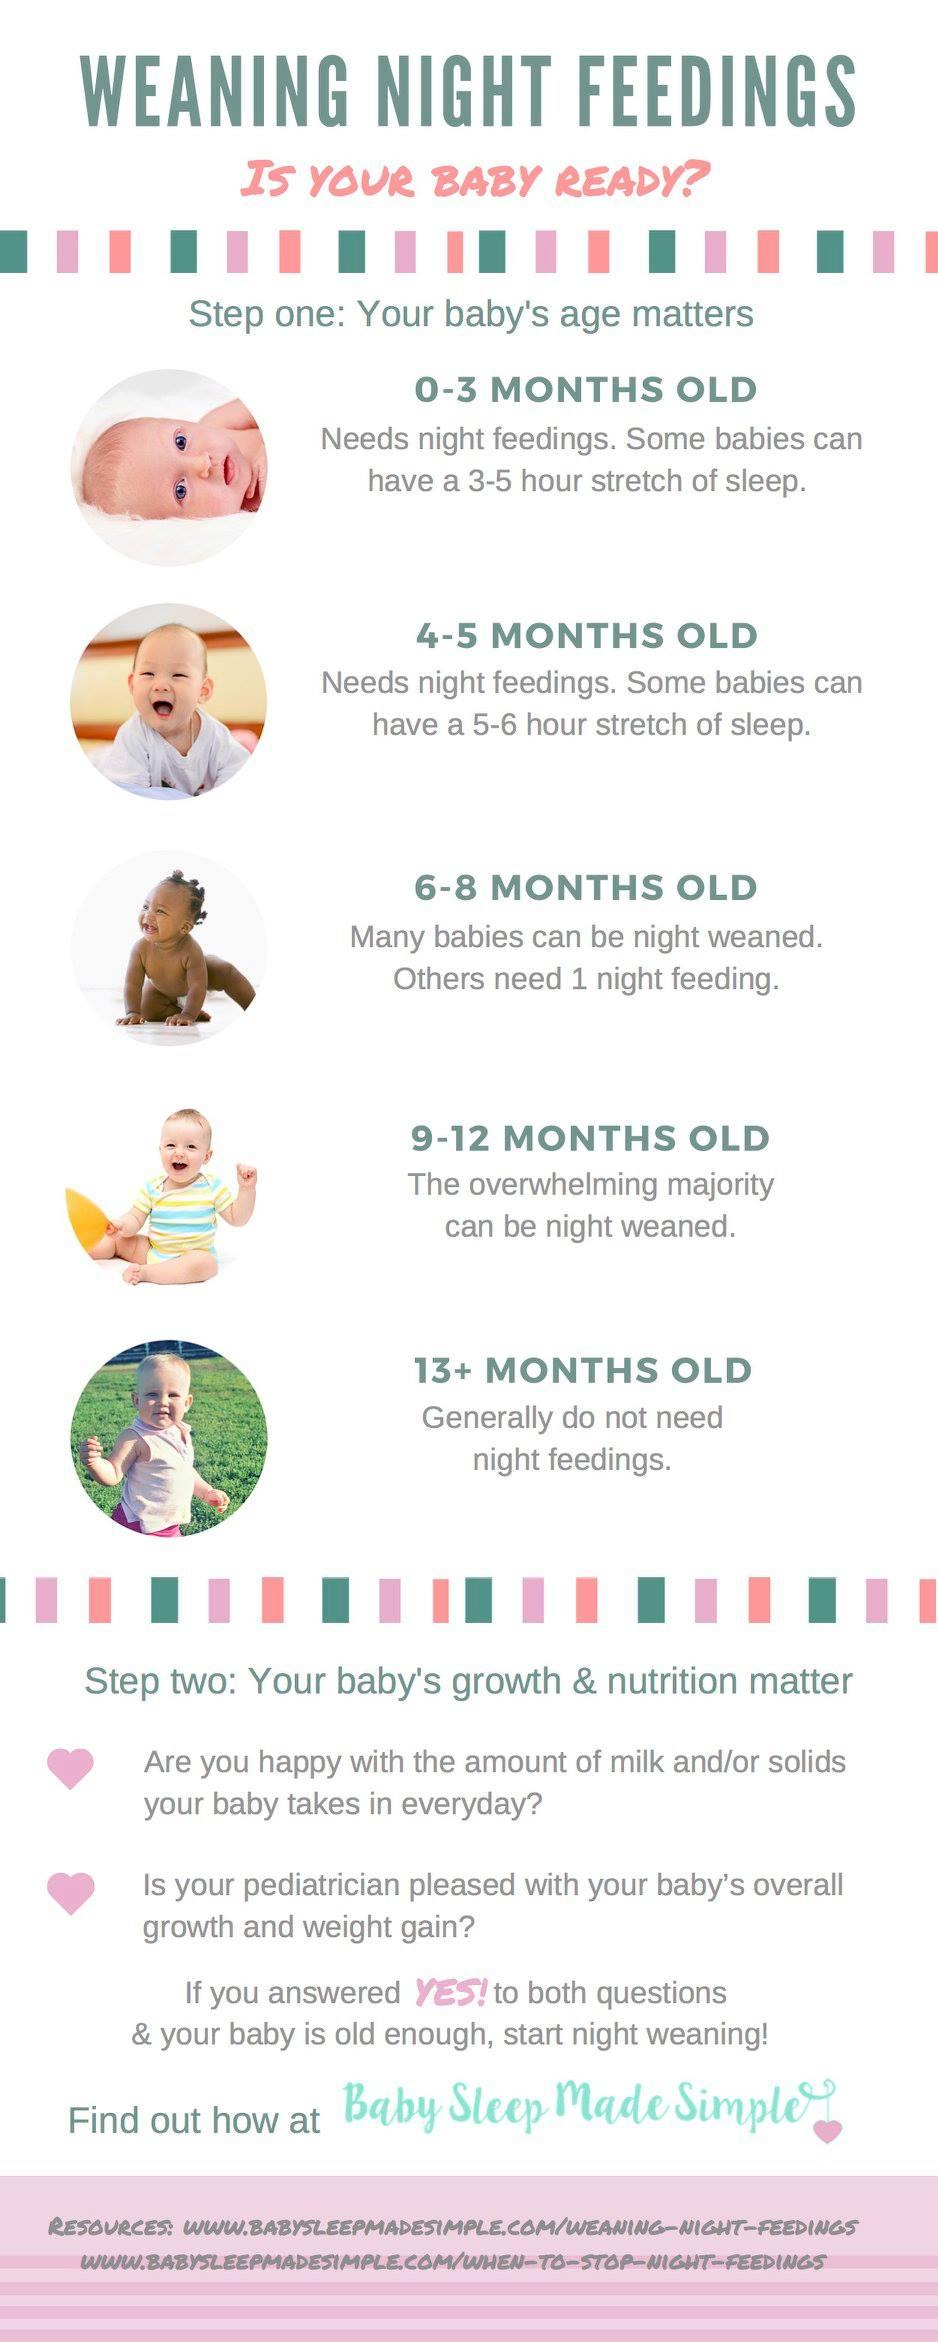 Weaning Night Feedings Baby Sleep Made Simple